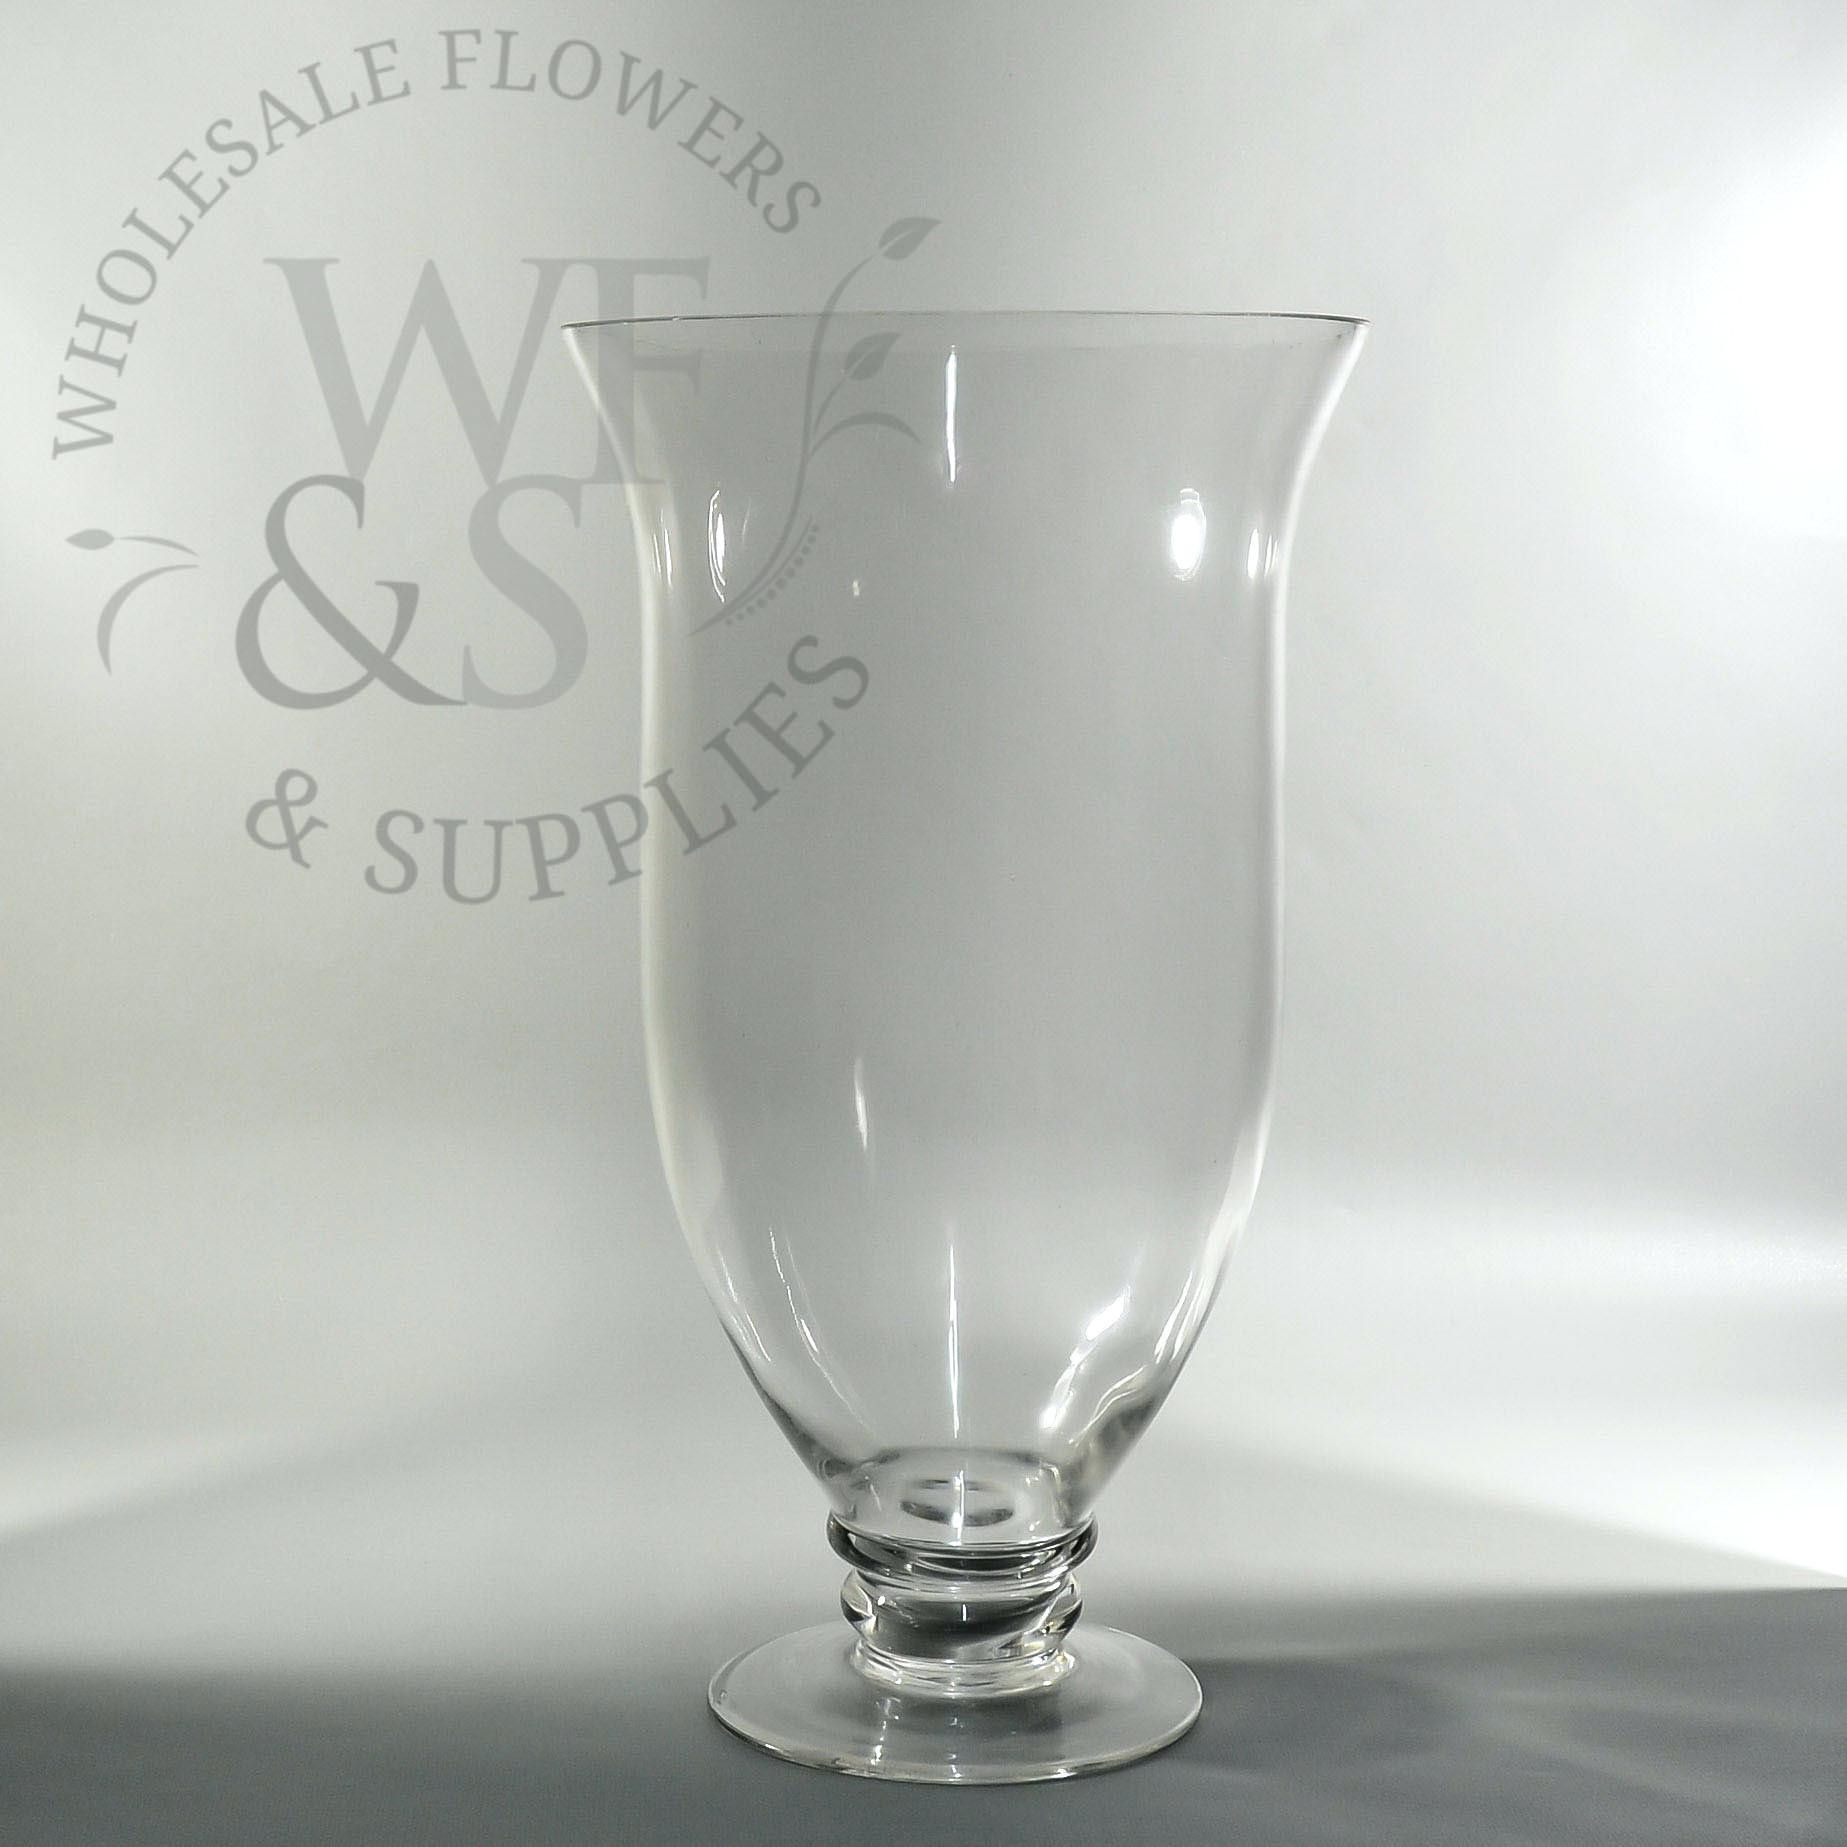 mercury glass hurricane vase of gold mercury glass vases new new mercury glass wall art kunuzmetals pertaining to gold mercury glass vases new new mercury glass wall art kunuzmetals